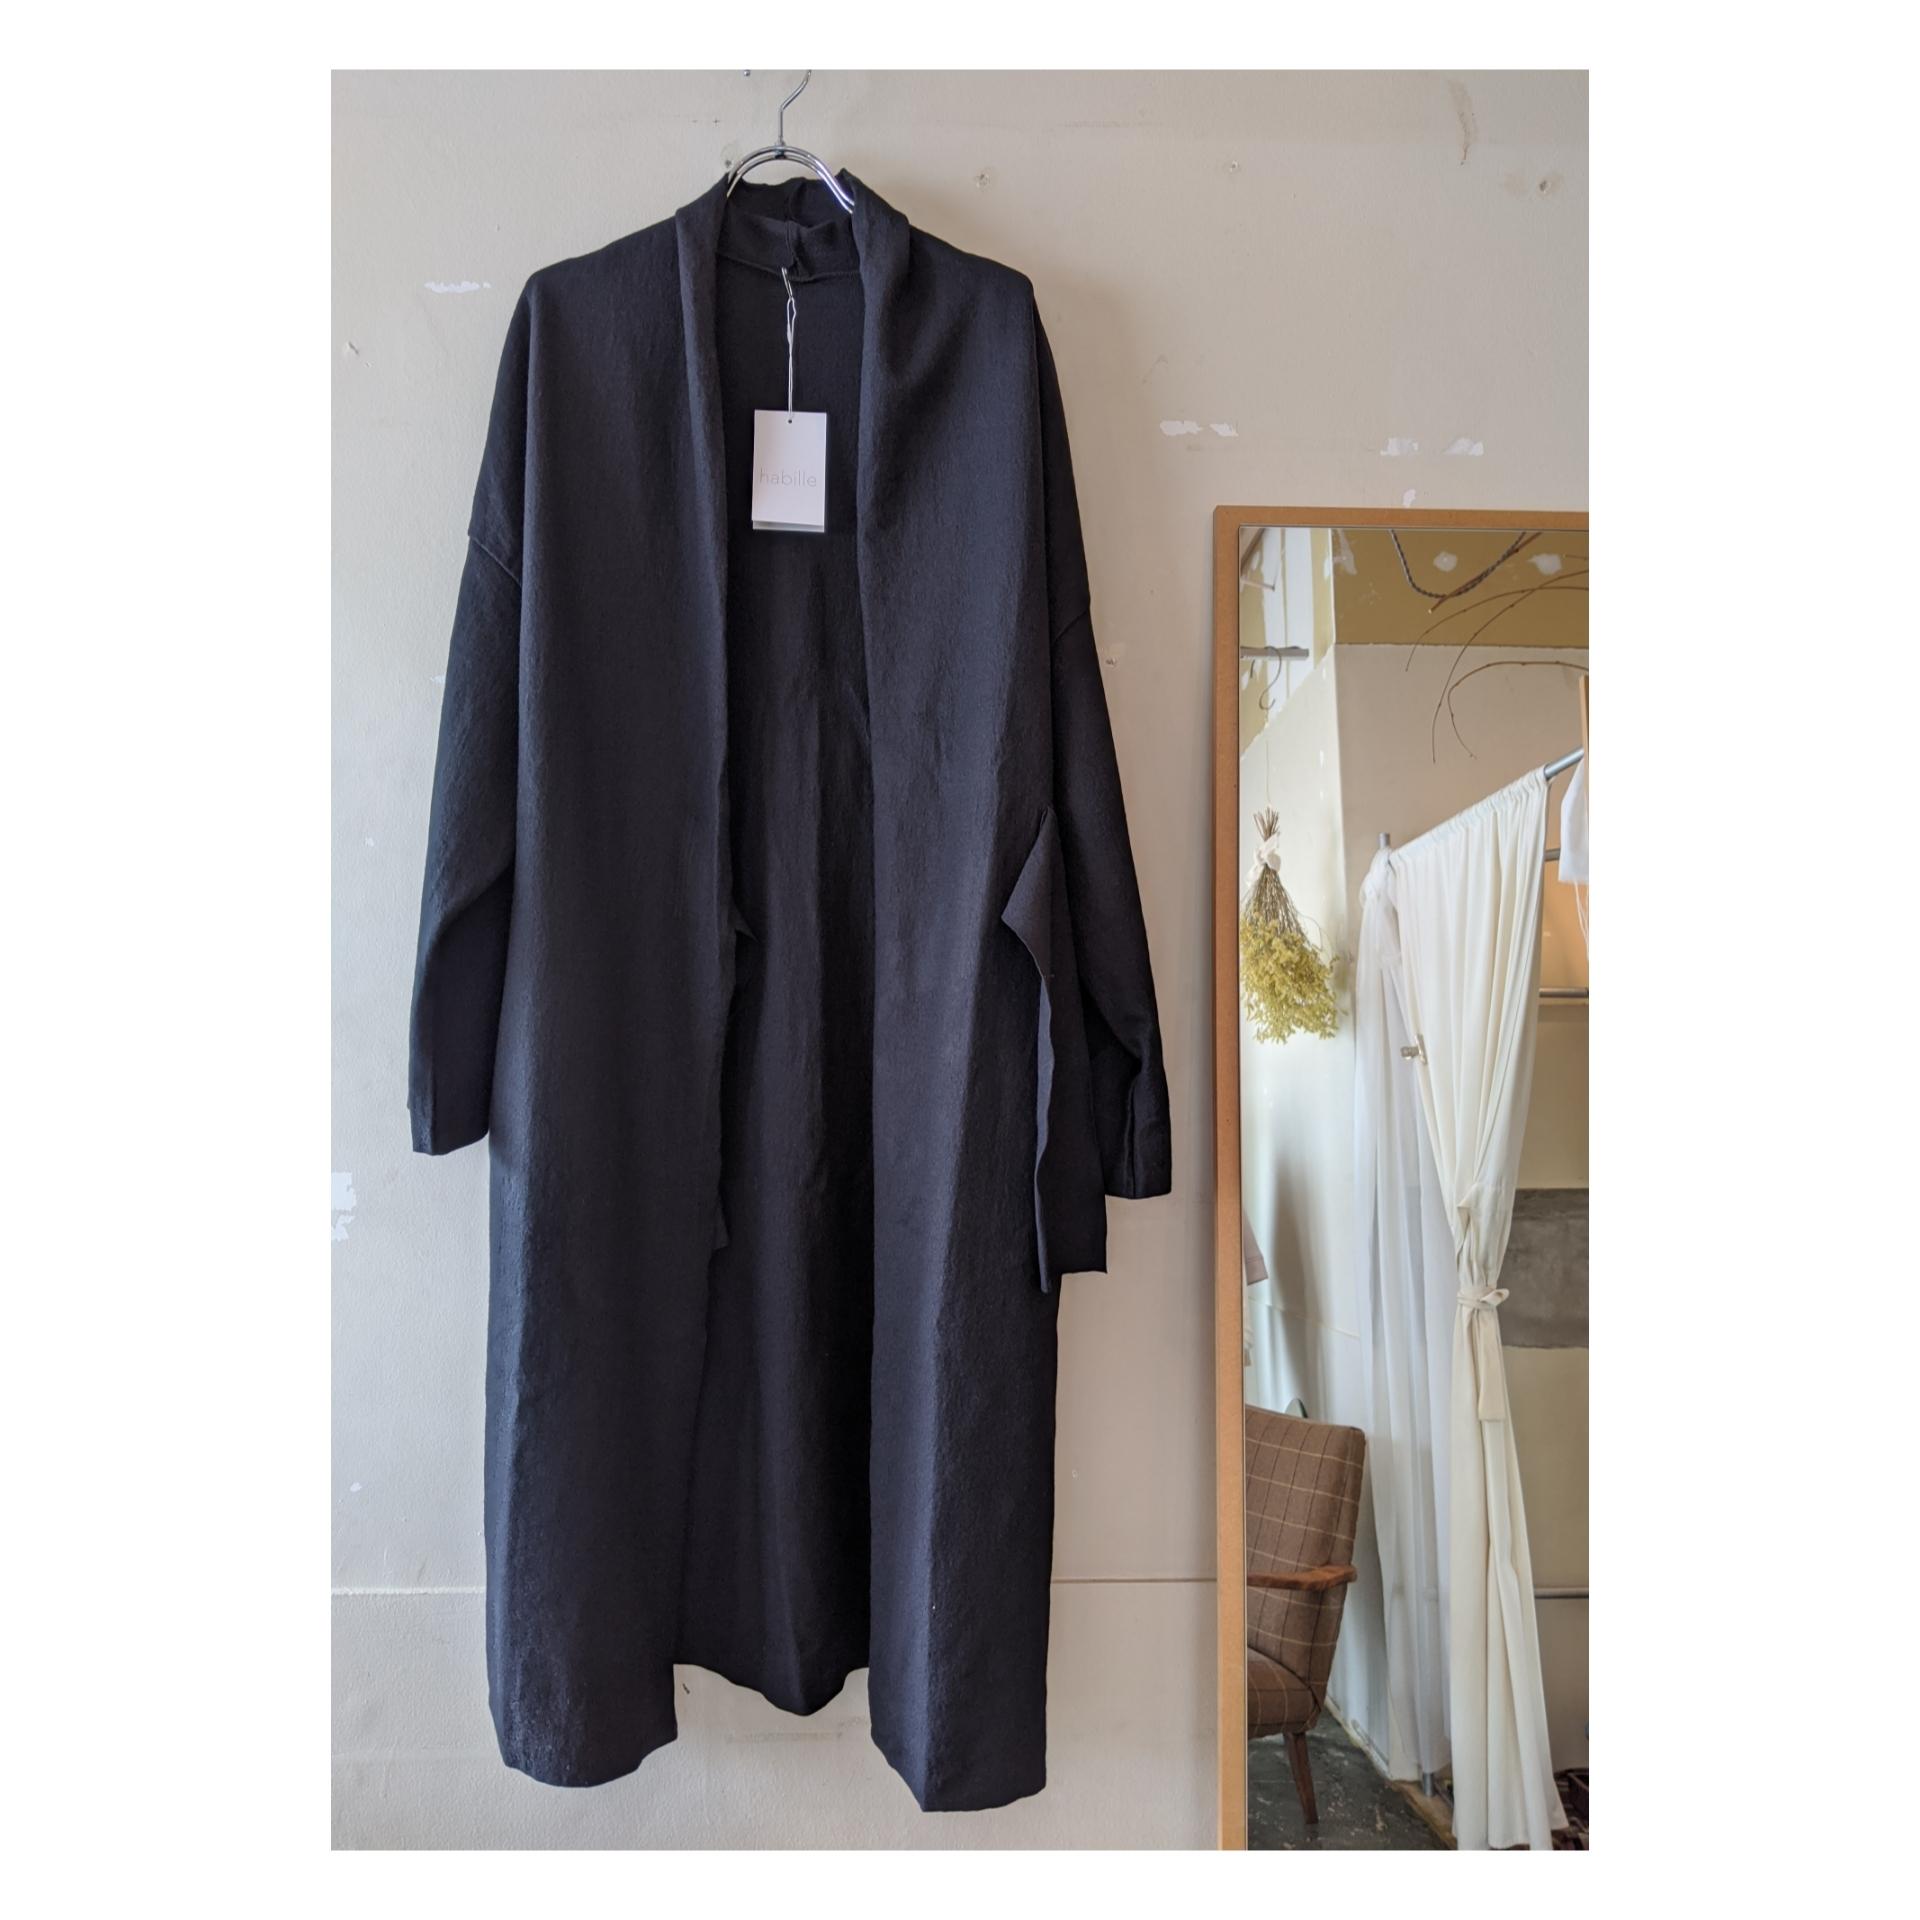 【 habille 】 gown coat / compressed wool / 圧縮ウール / ウールコート / BLACK